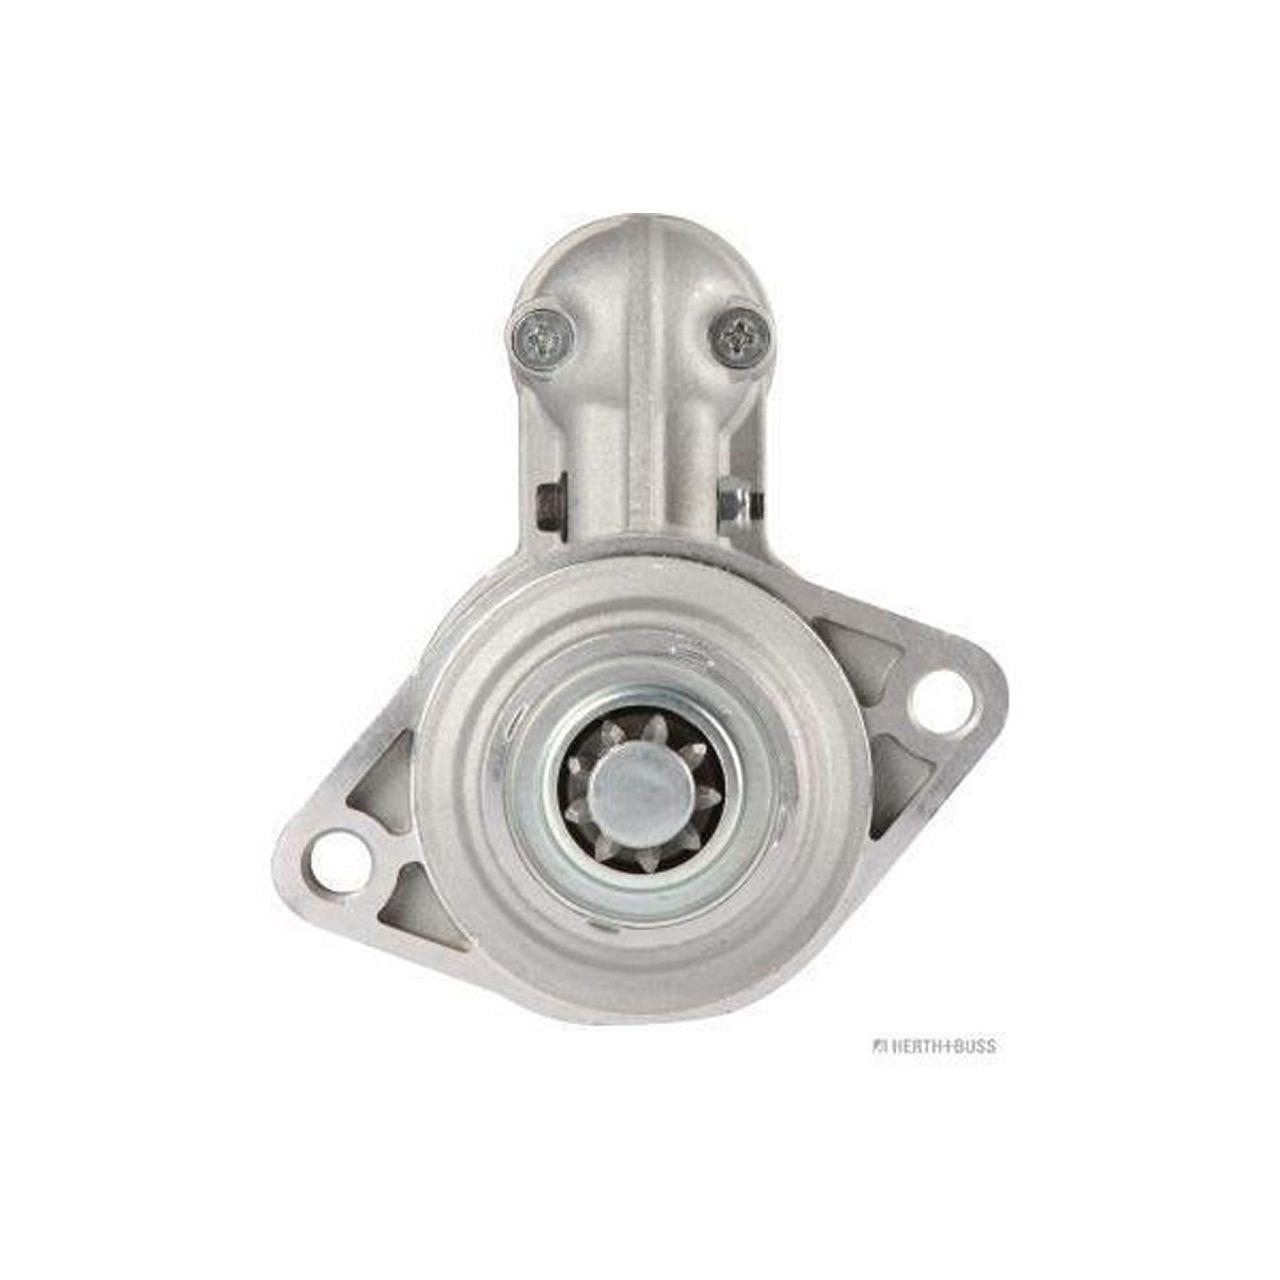 HERTH+BUSS ELPARTS Anlasser Starter 12V 0,7 kW PORSCHE 911 914 VW Transporter T3